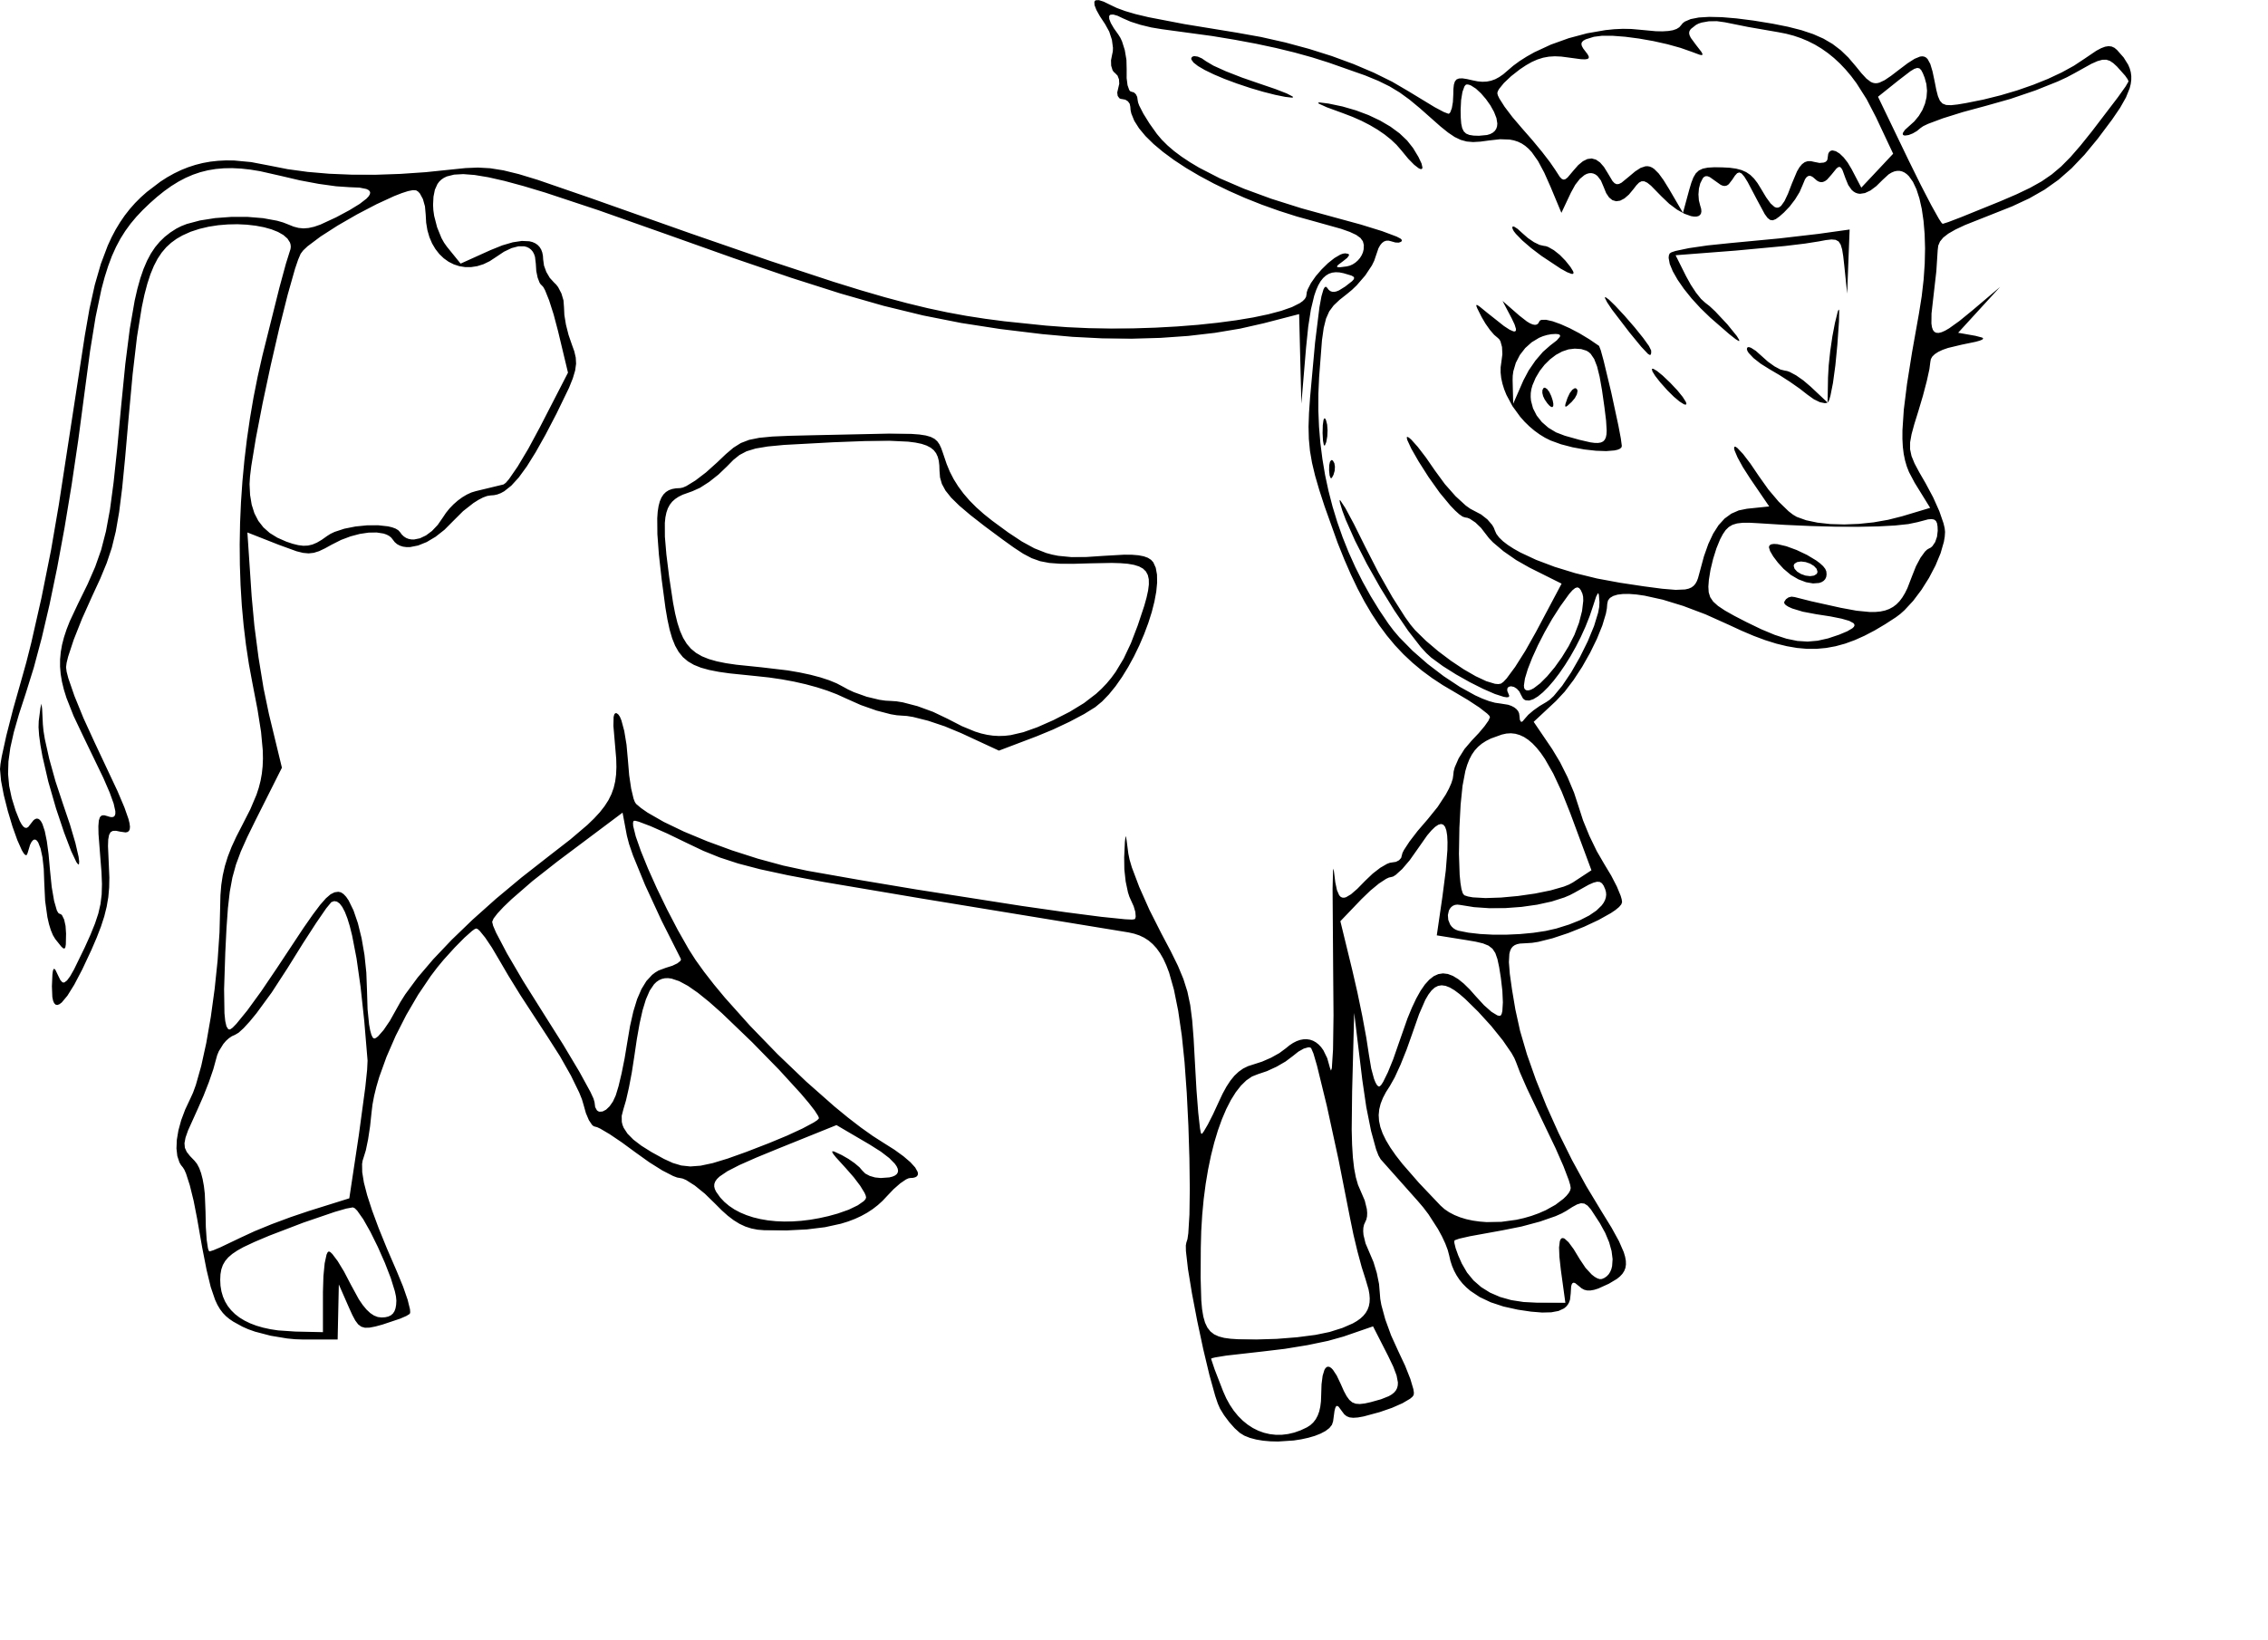 Veau coloriage - Dessin vache facile ...